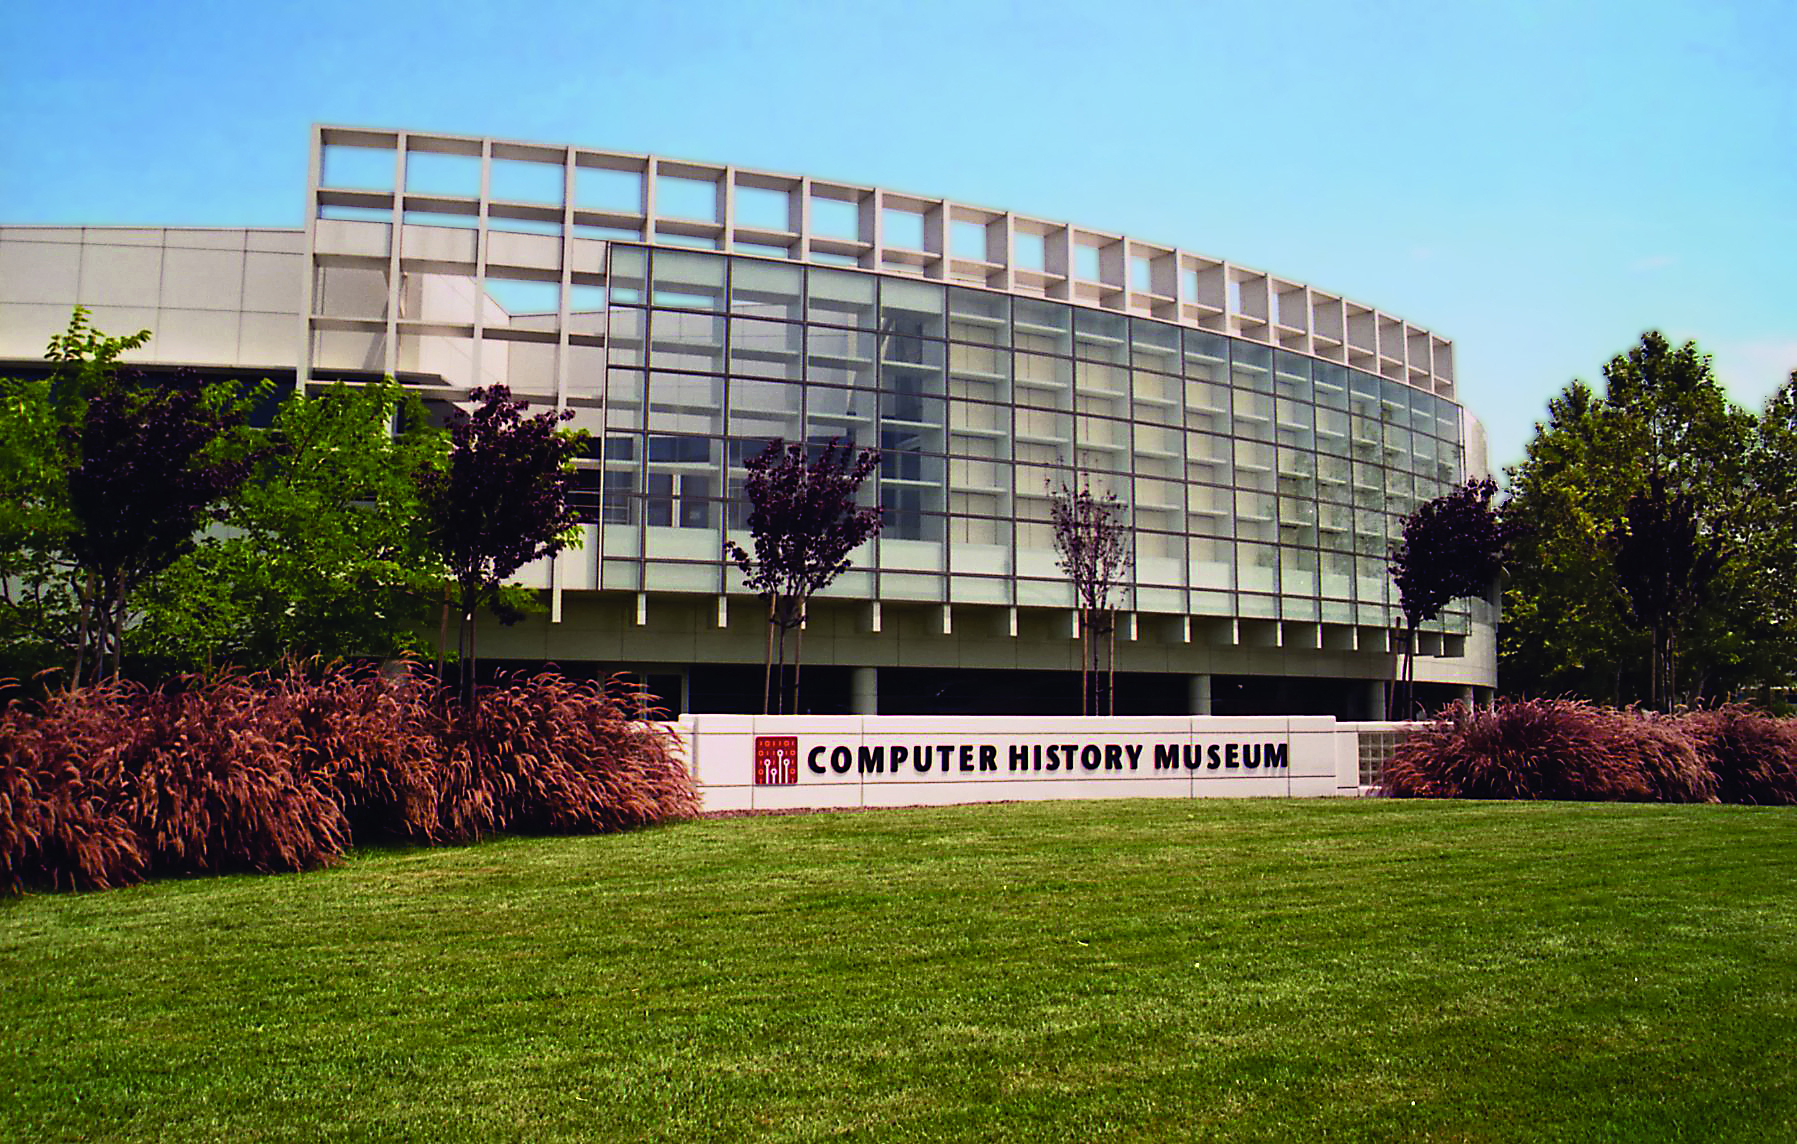 Full Exterior Computer History Museum Raspberry Pi